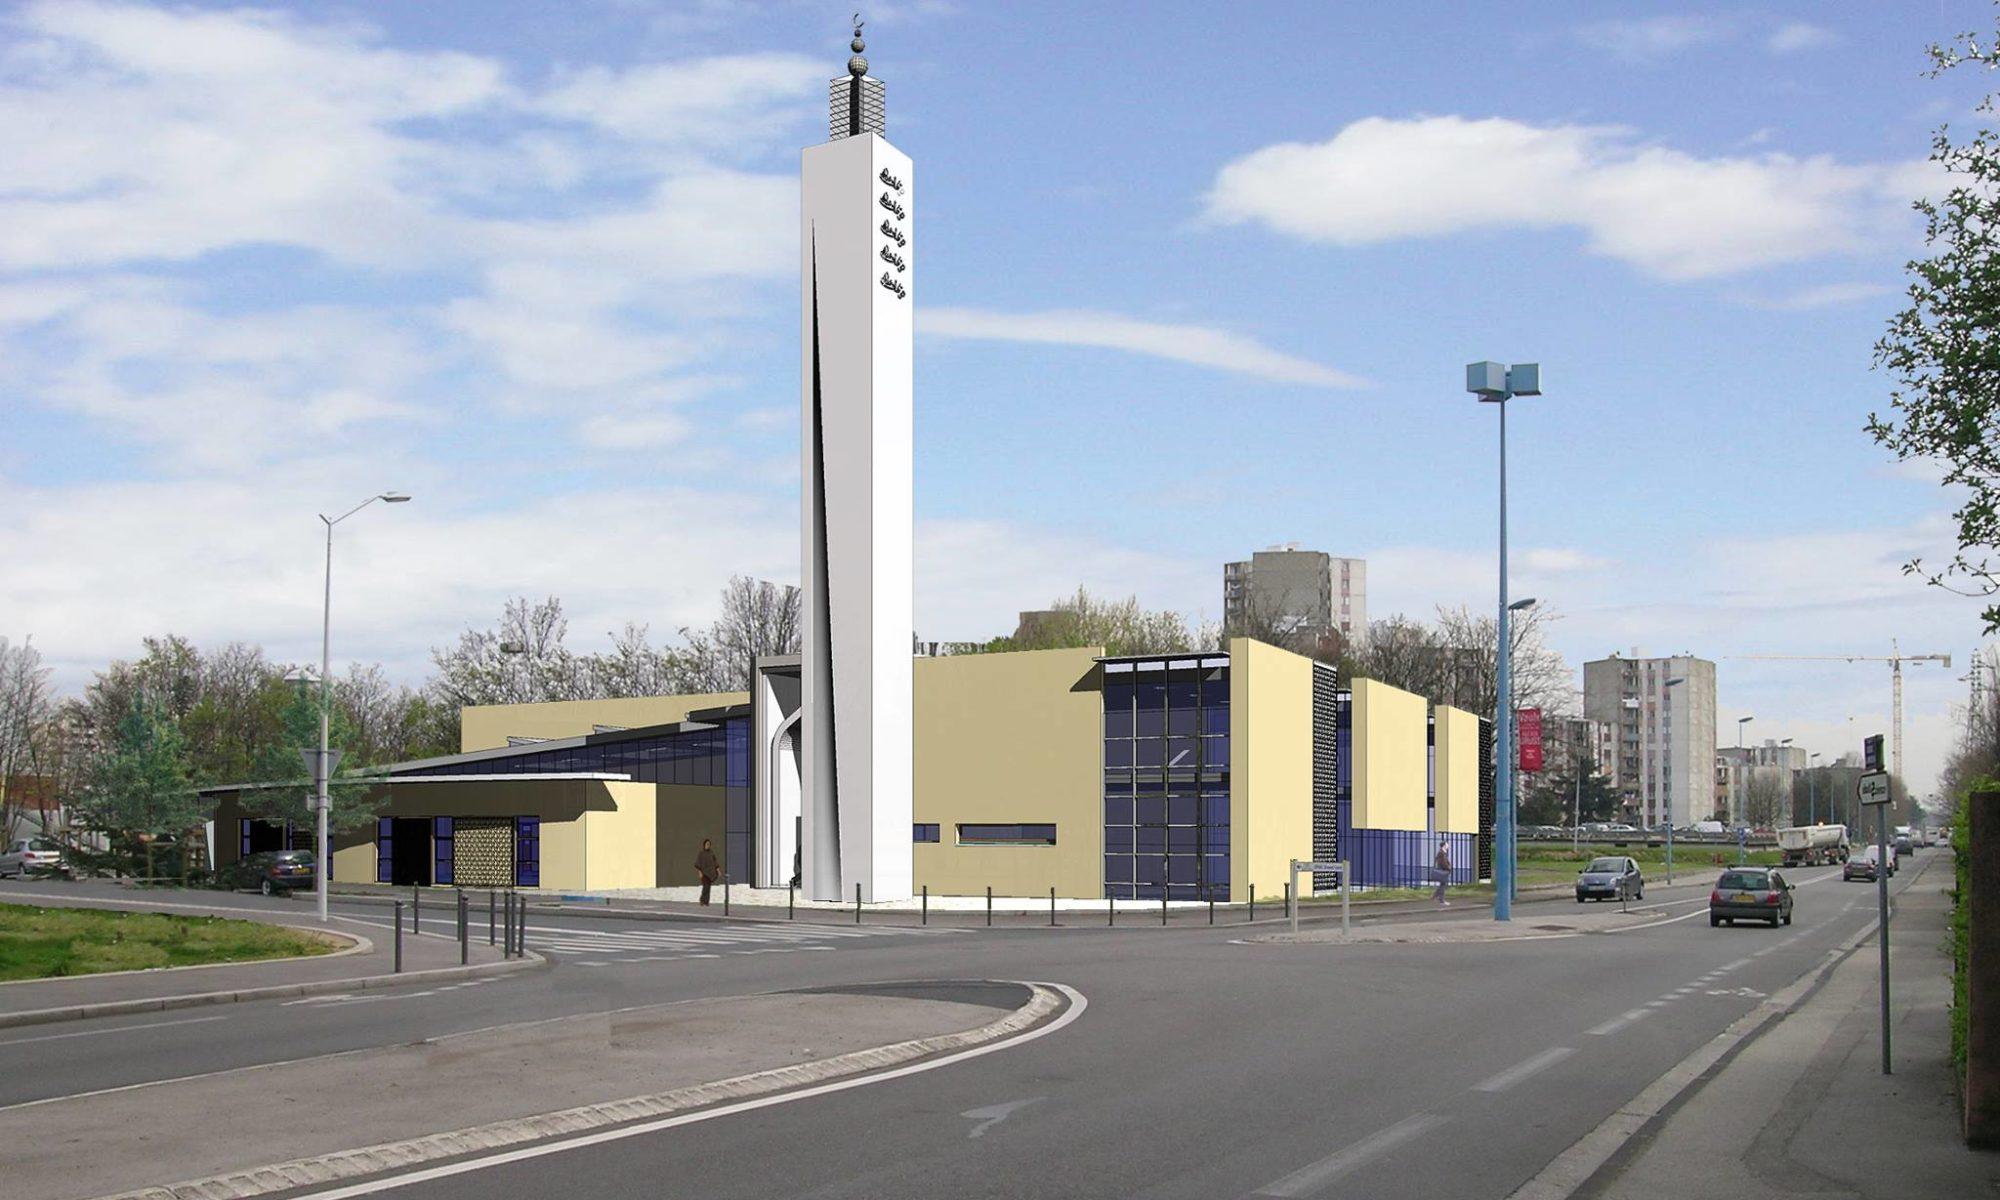 CENTRE MUSULMAN DE VAULX-EN-VELIN